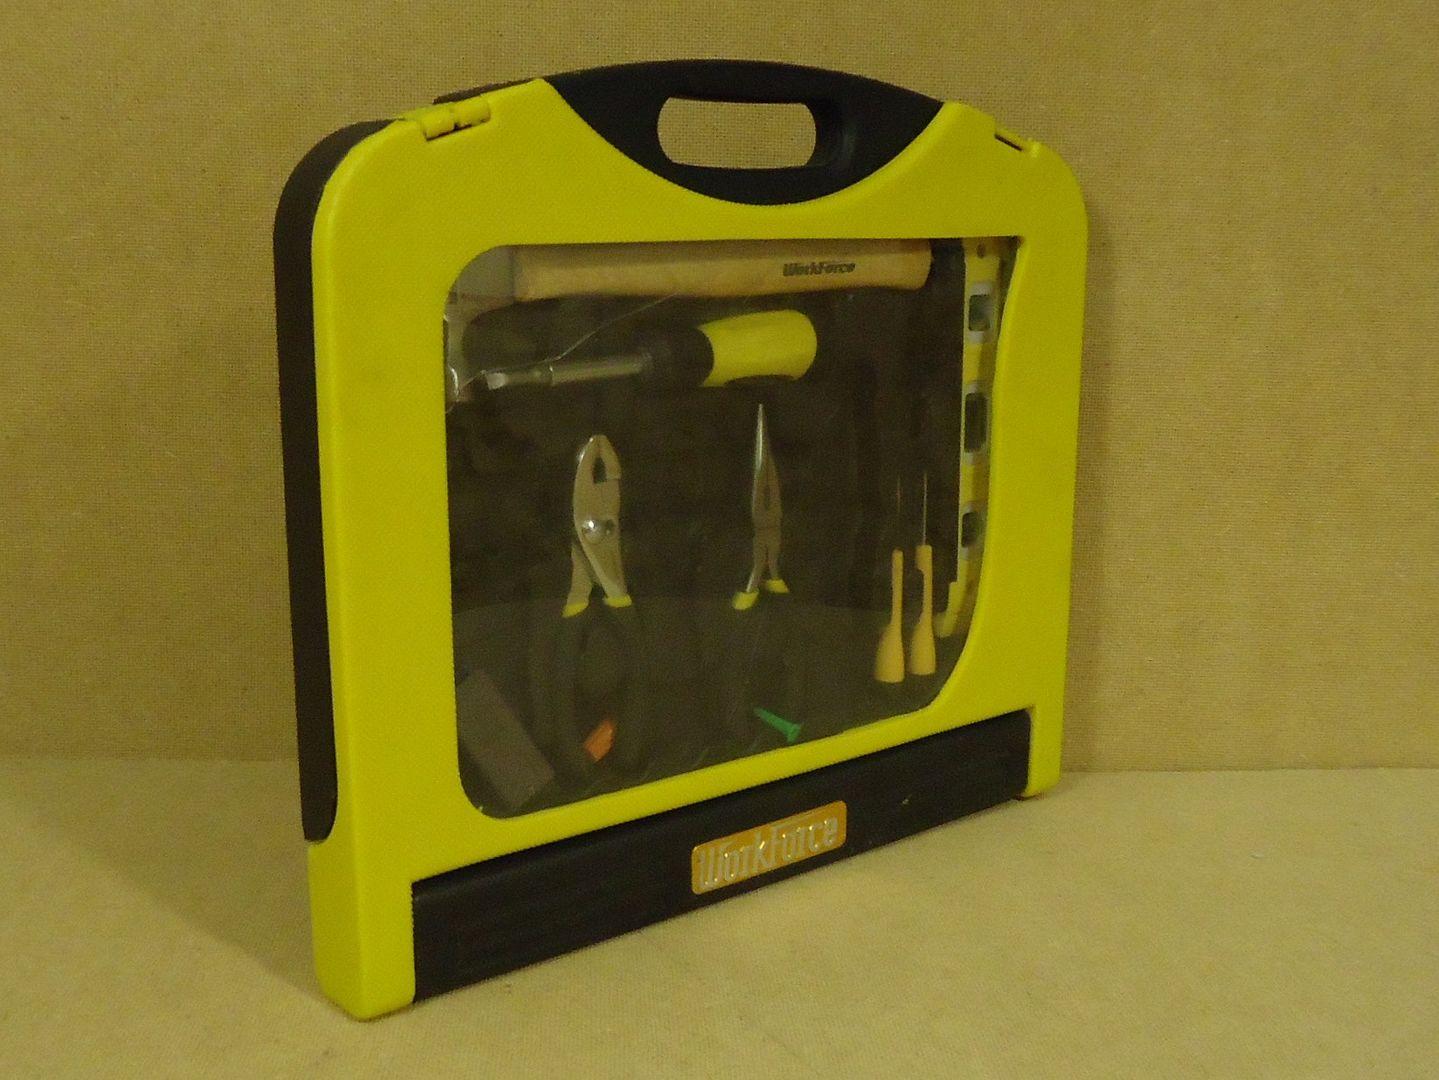 mm1766 100312-502d WorkForce Portable Tool Set 17 1/4in x 15in x 2in Yellow/Black Plastic Metal